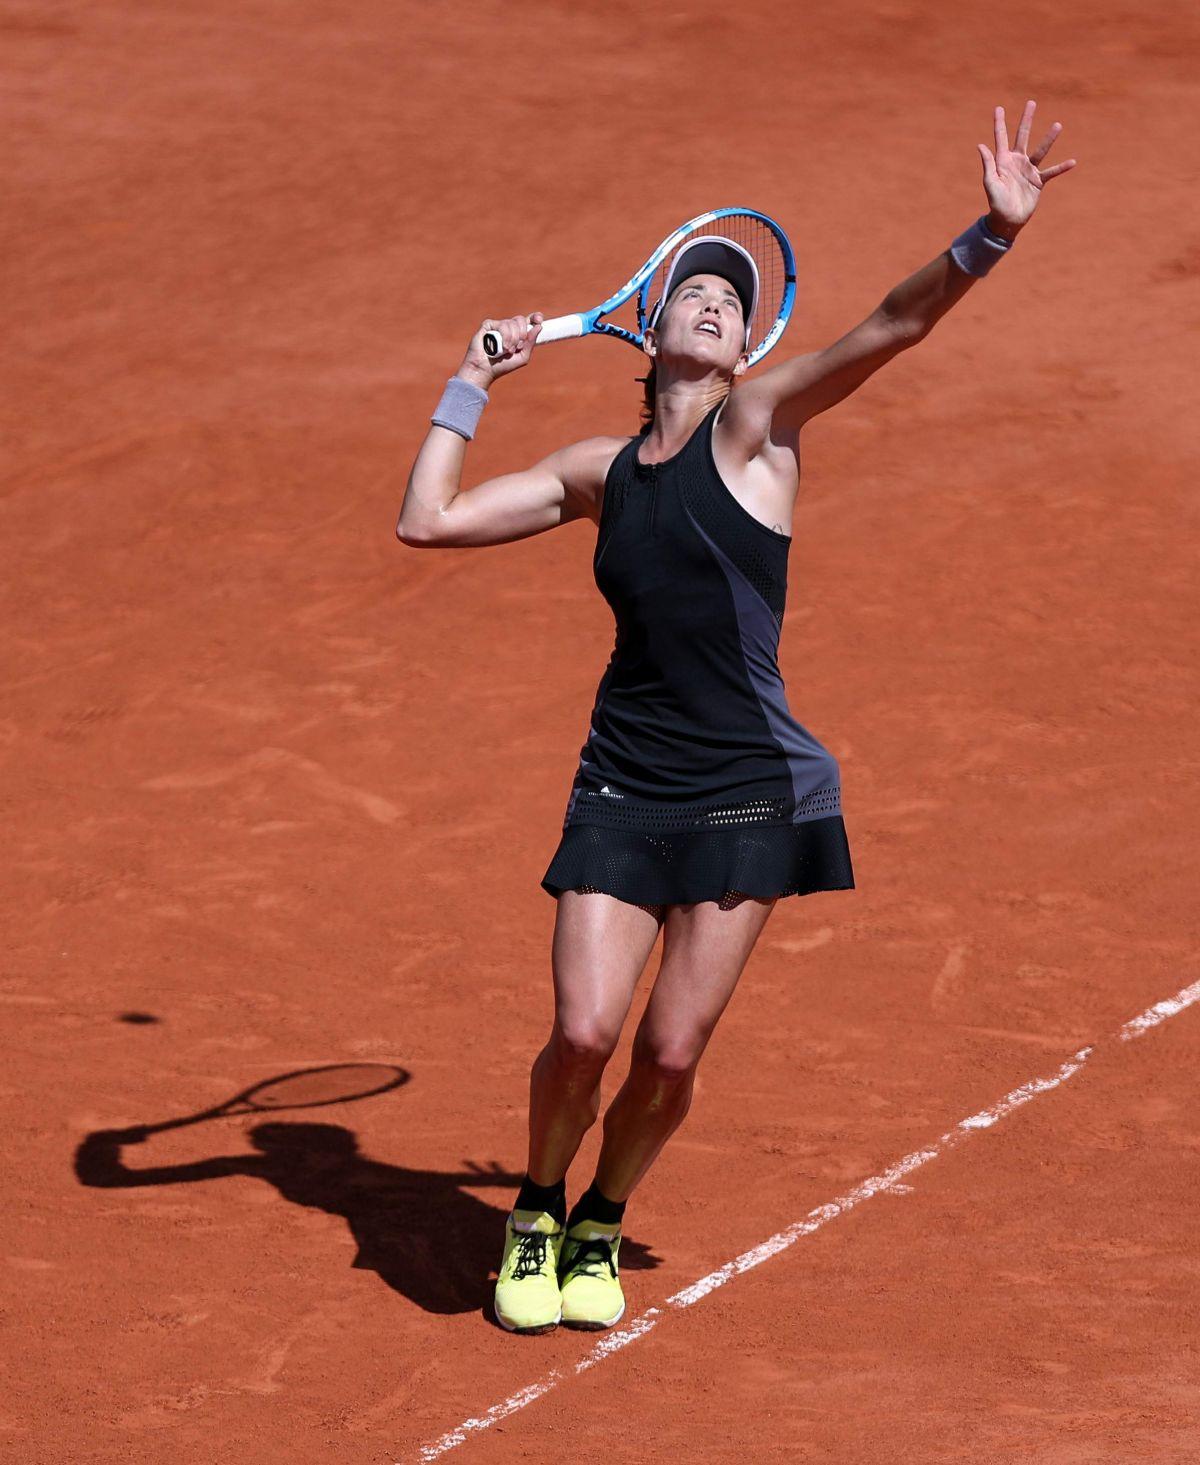 Muguruza Tennis